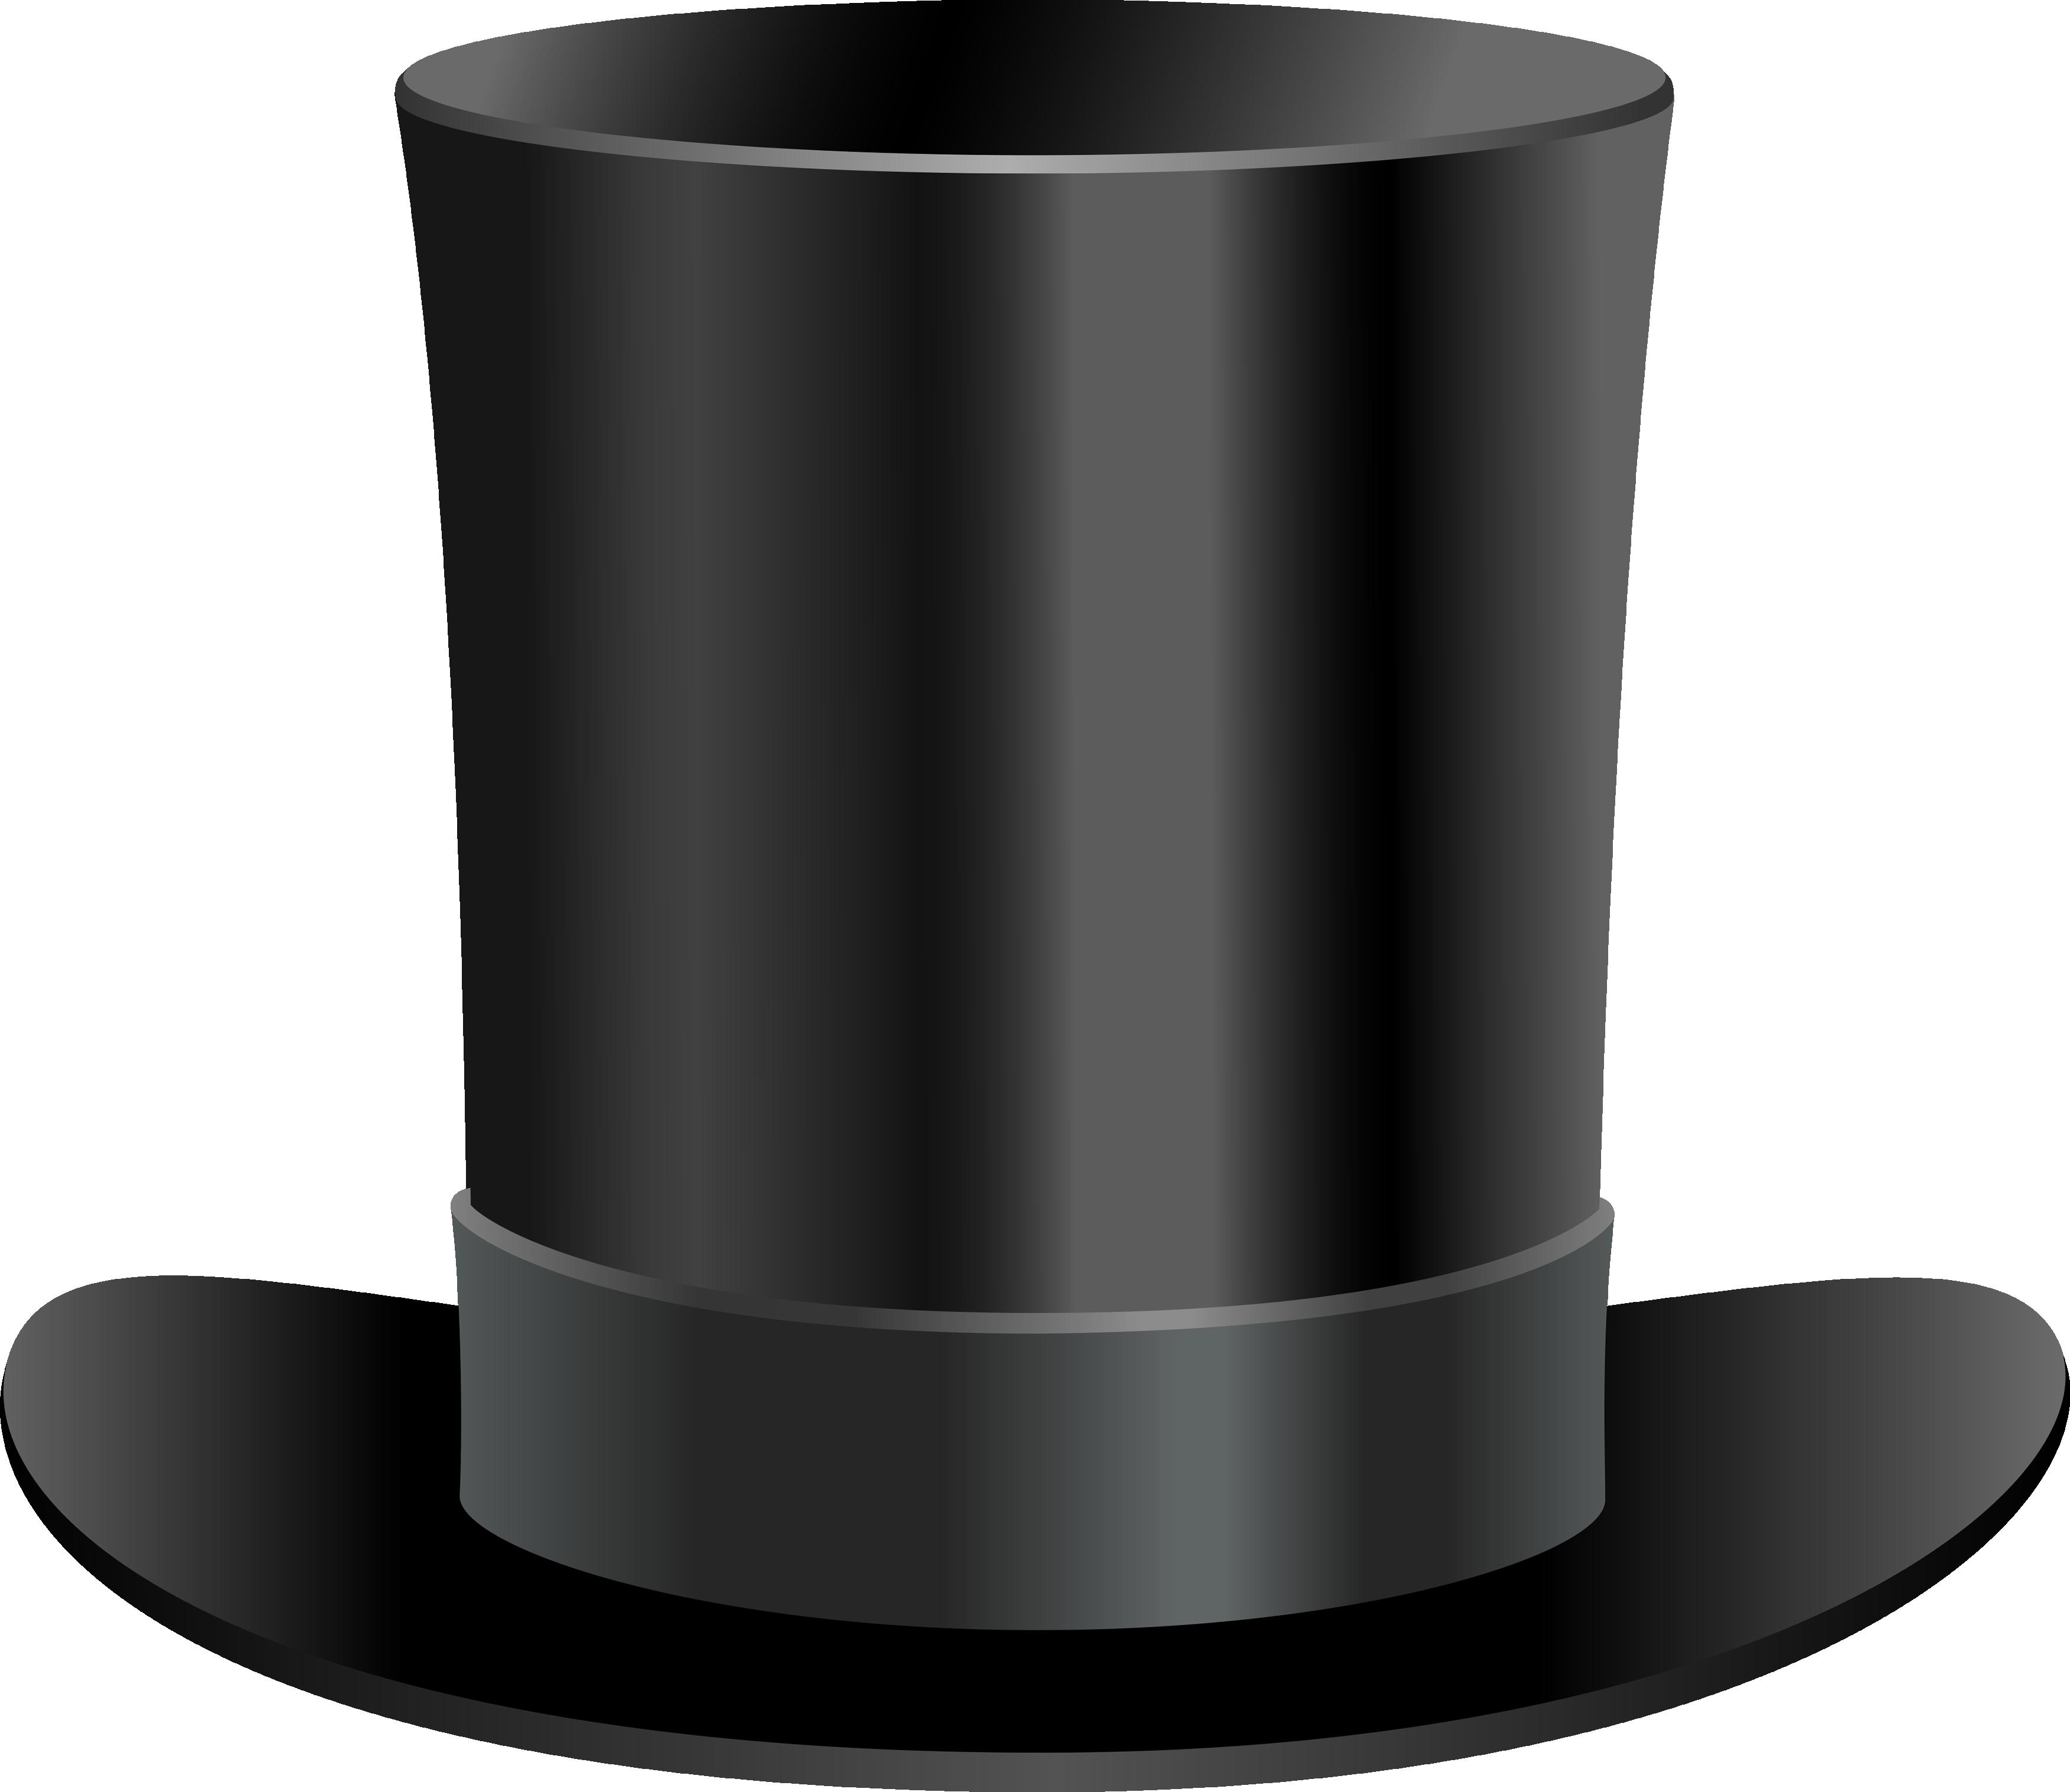 Black Top Hat Png Image Top Hat Black Top Hat Hats